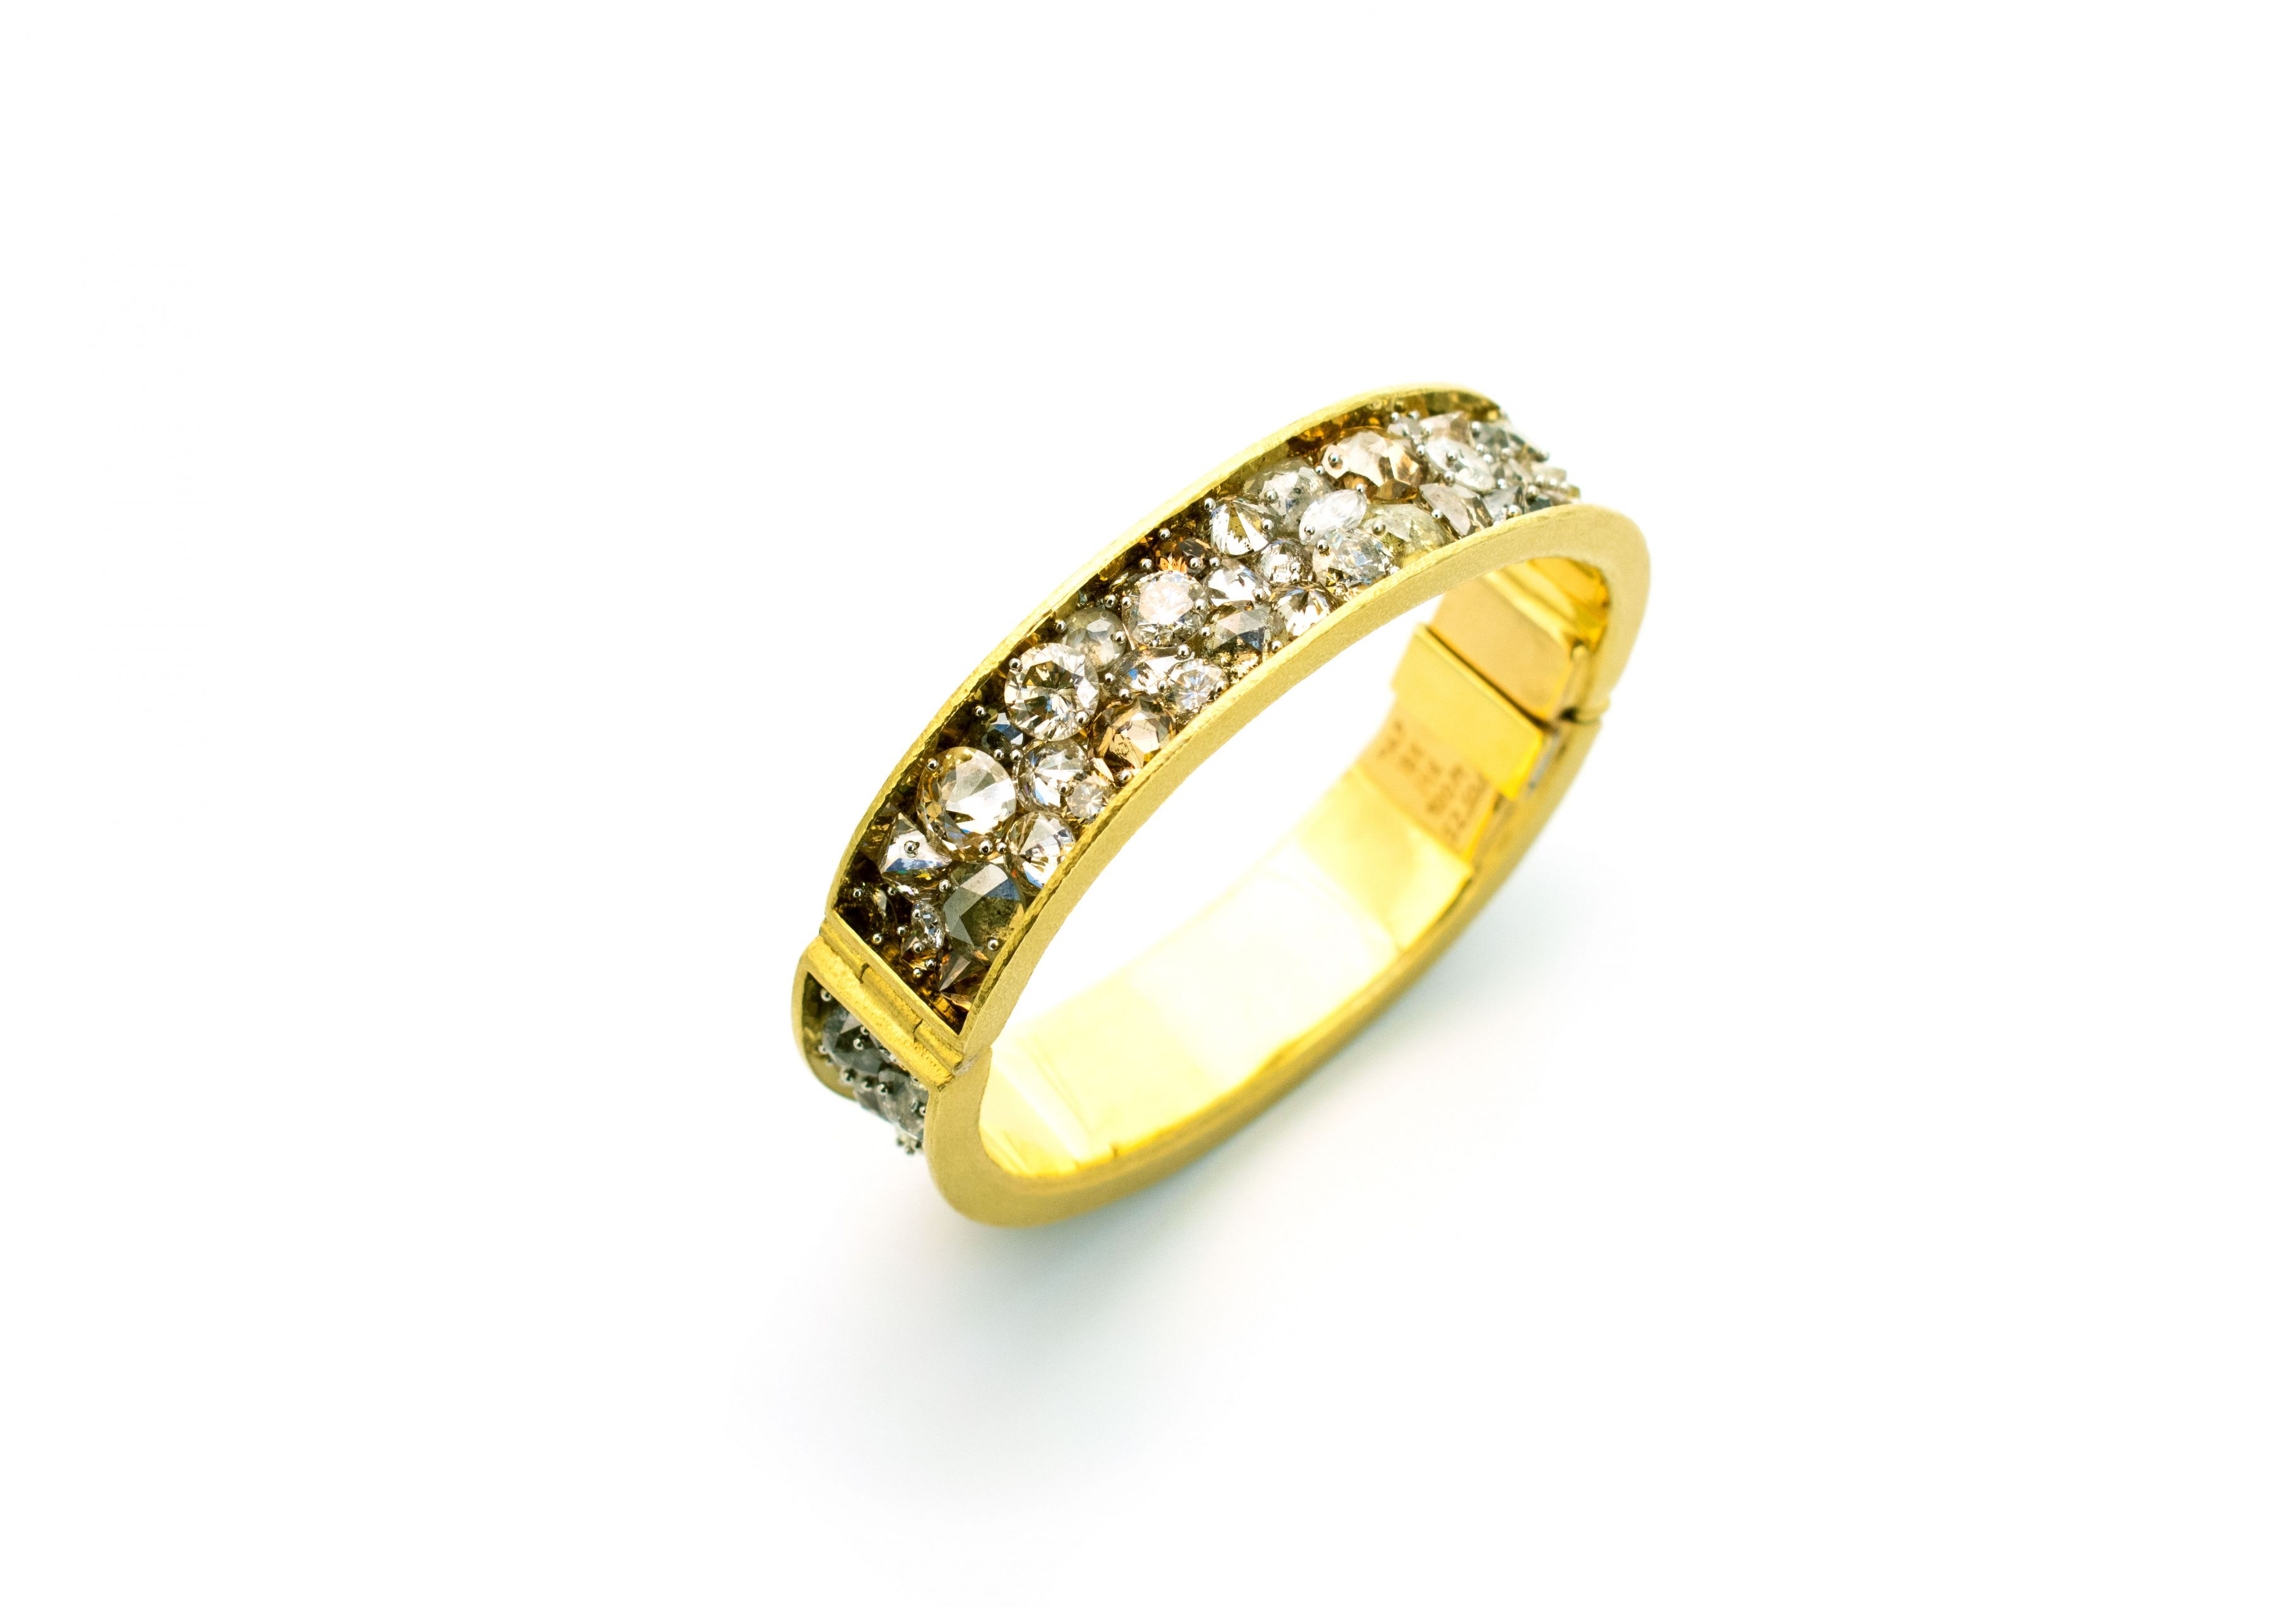 Todd Pownell, diamond bracelet